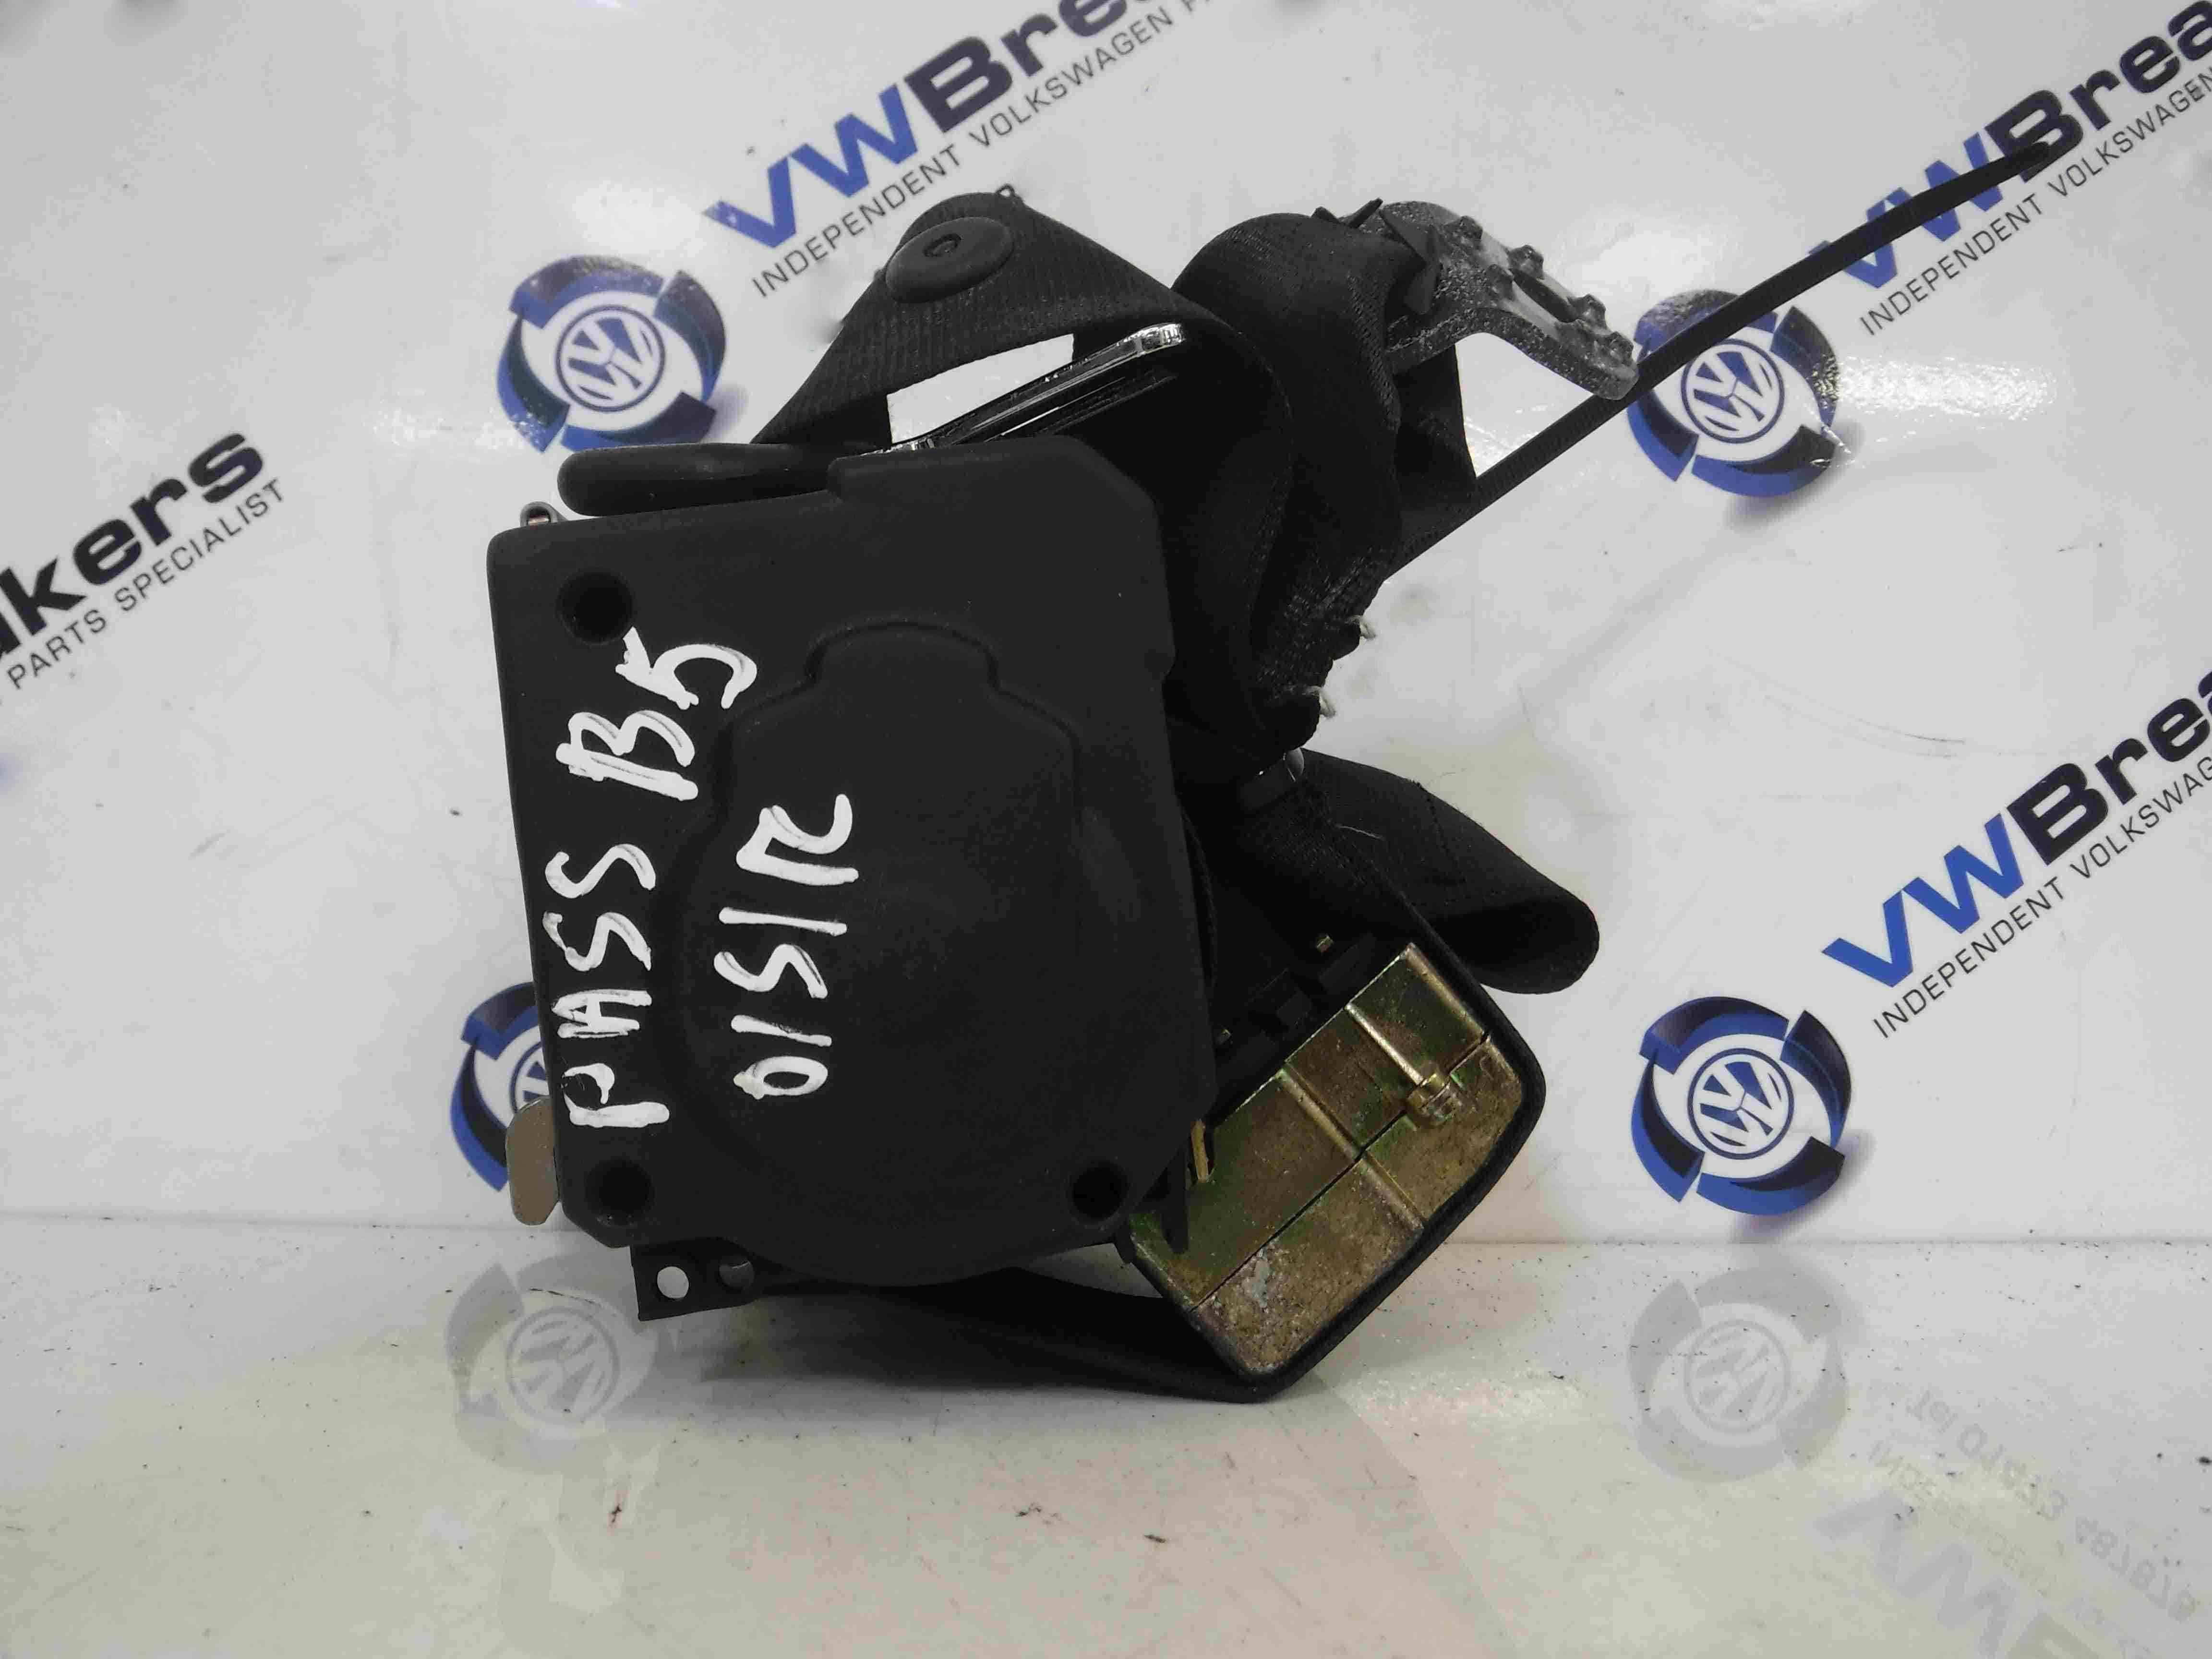 Volkswagen Passat + Est 2001-2005 B5.5 Drivers OSR Rear Seat Belt